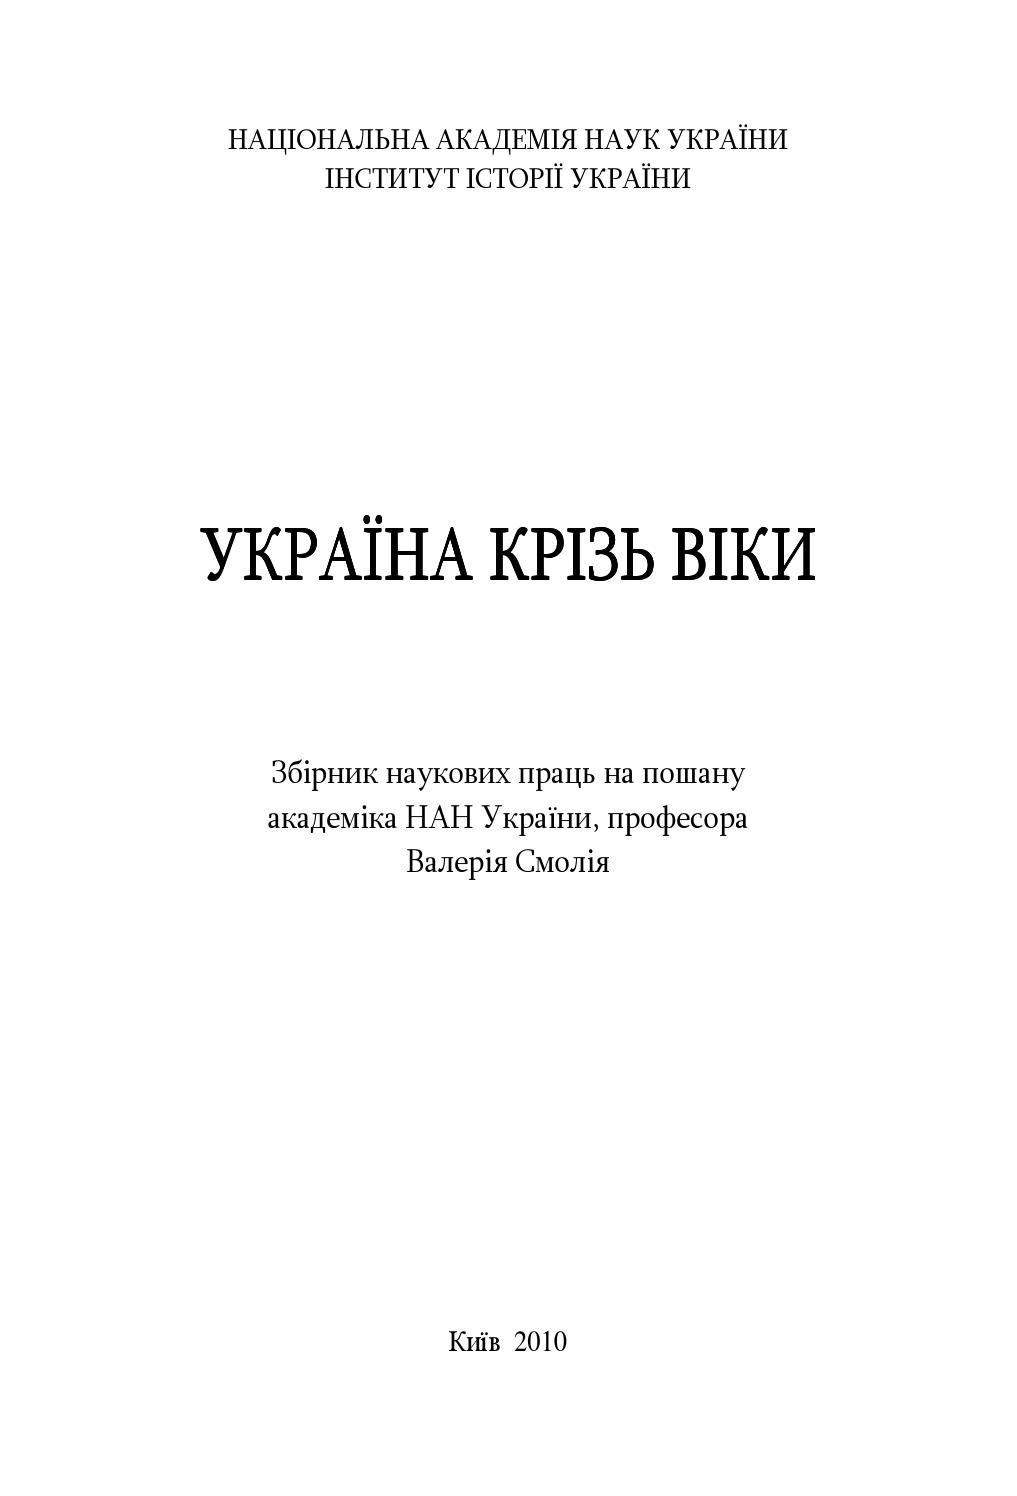 Україна крізь віки Частина-3 by Watra - issuu 92279c354da2e